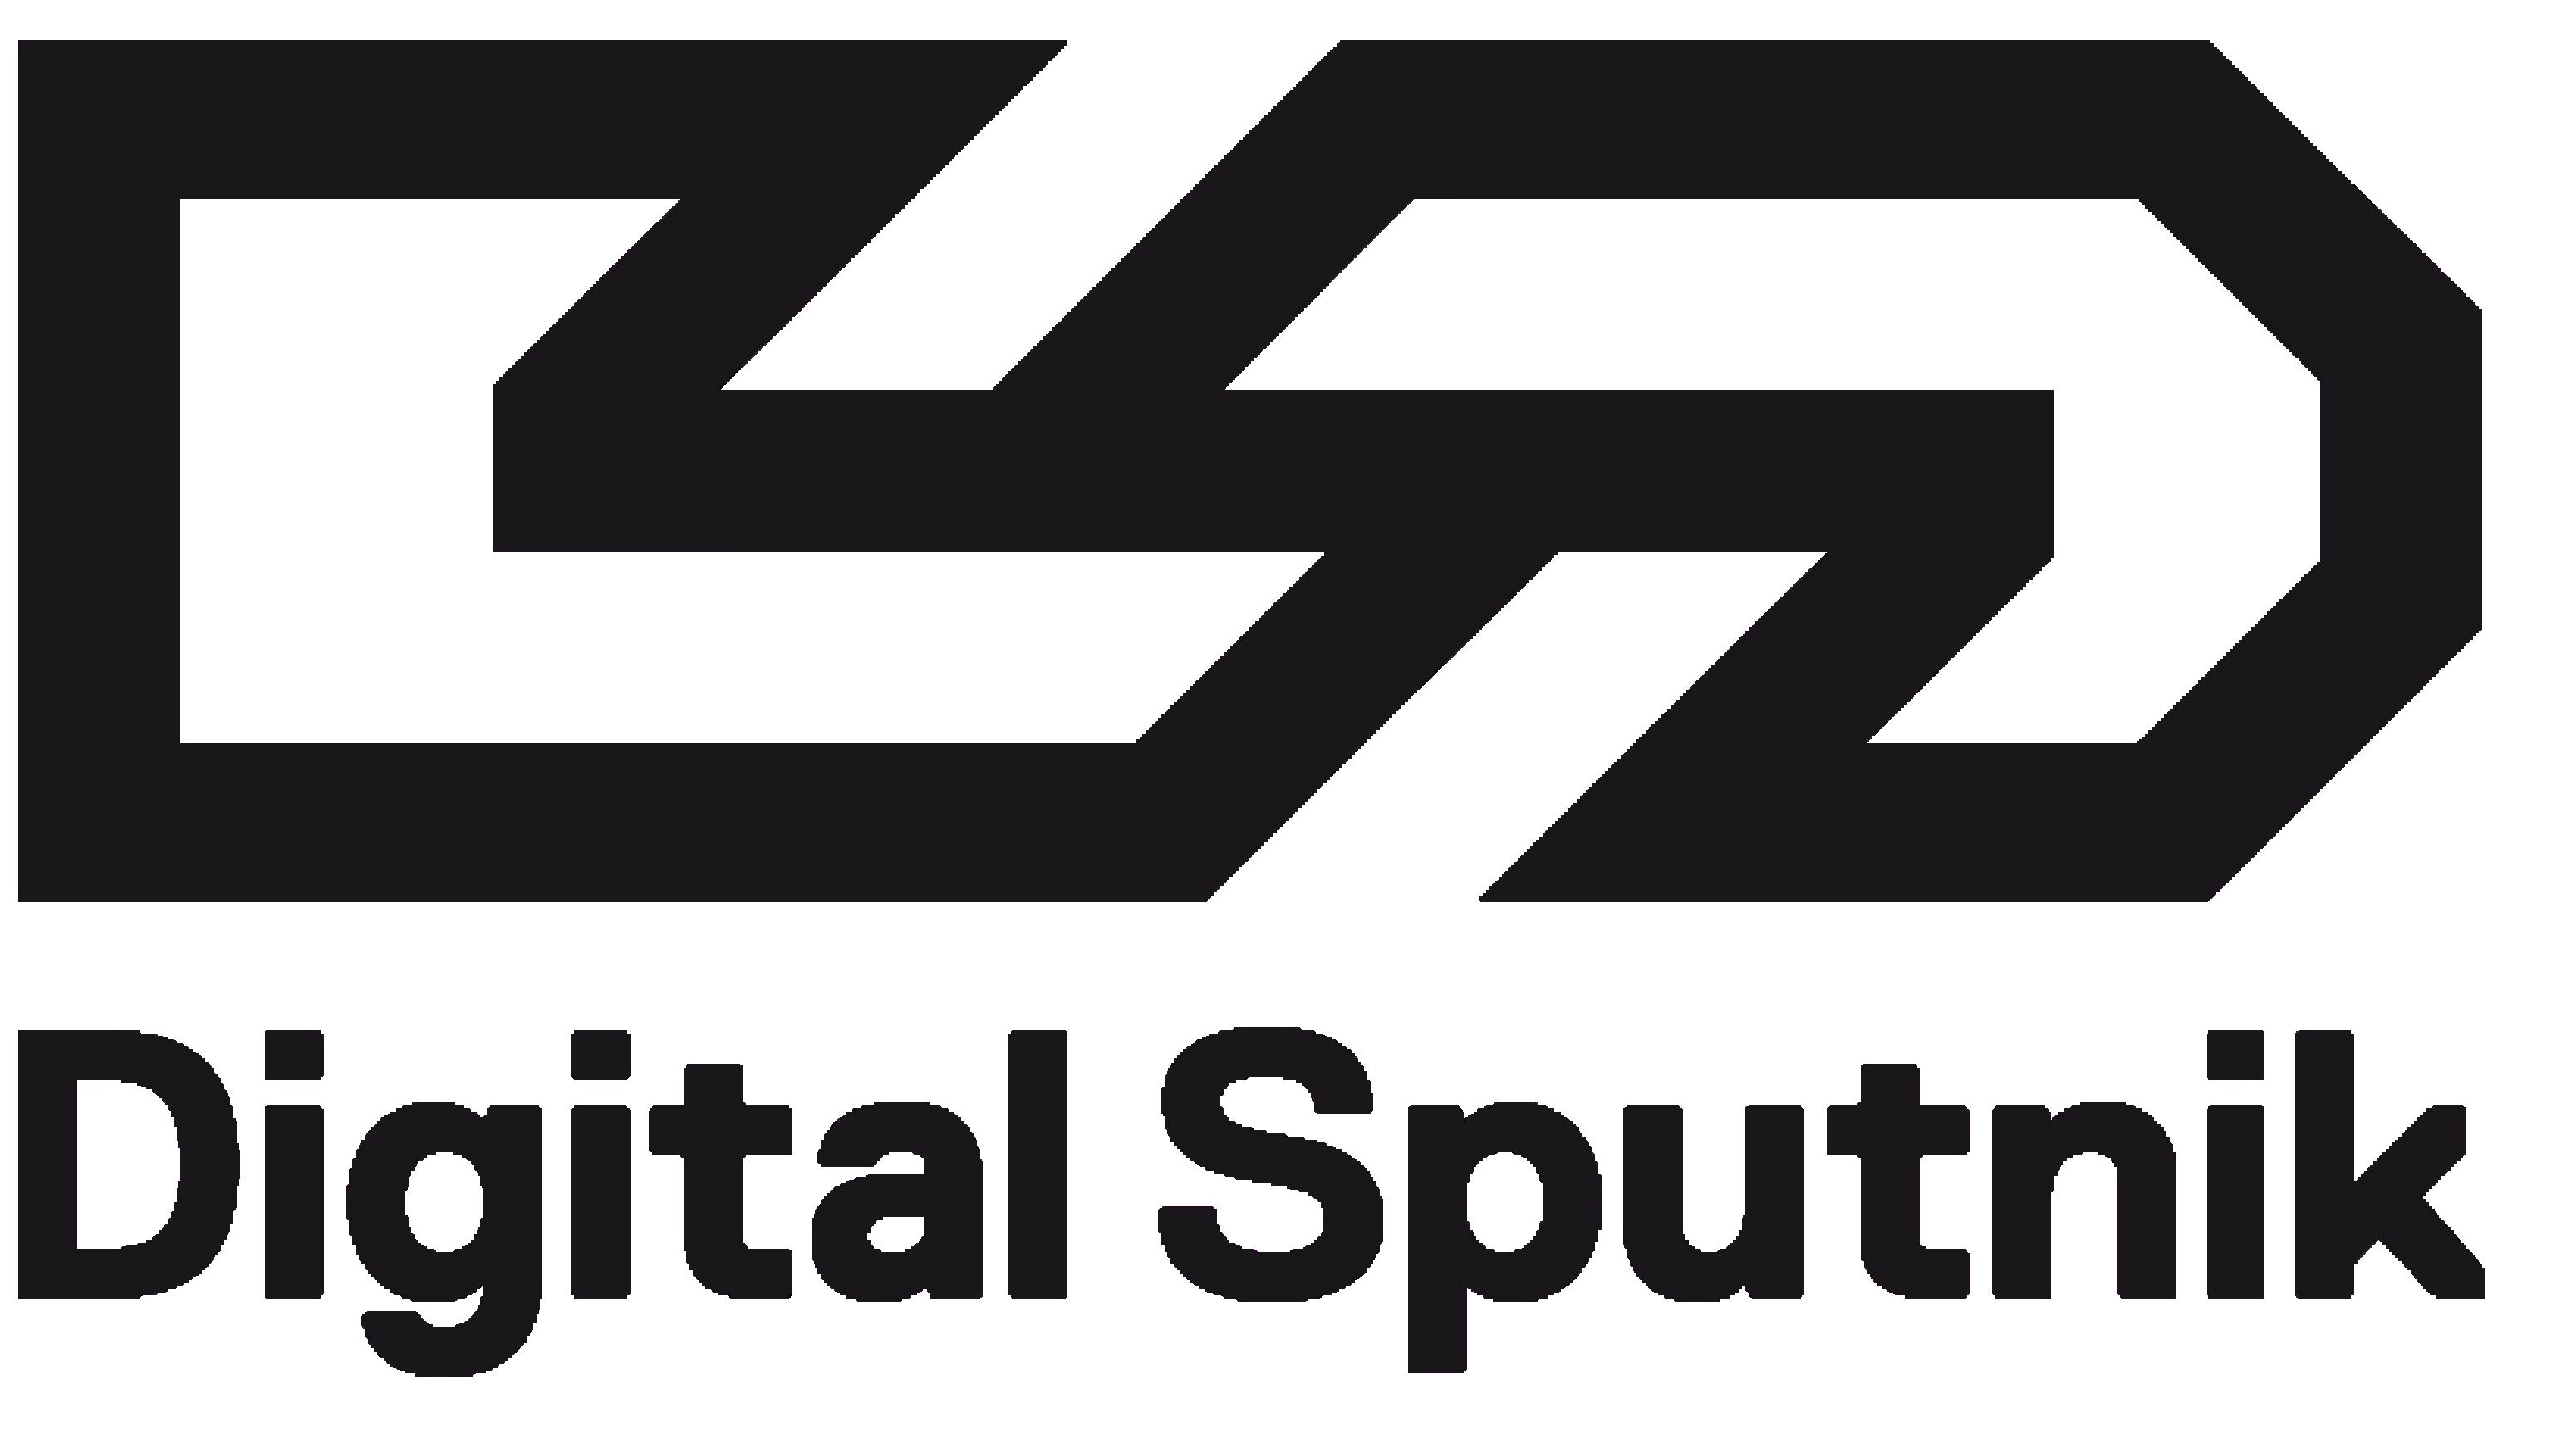 Digital Sputnik